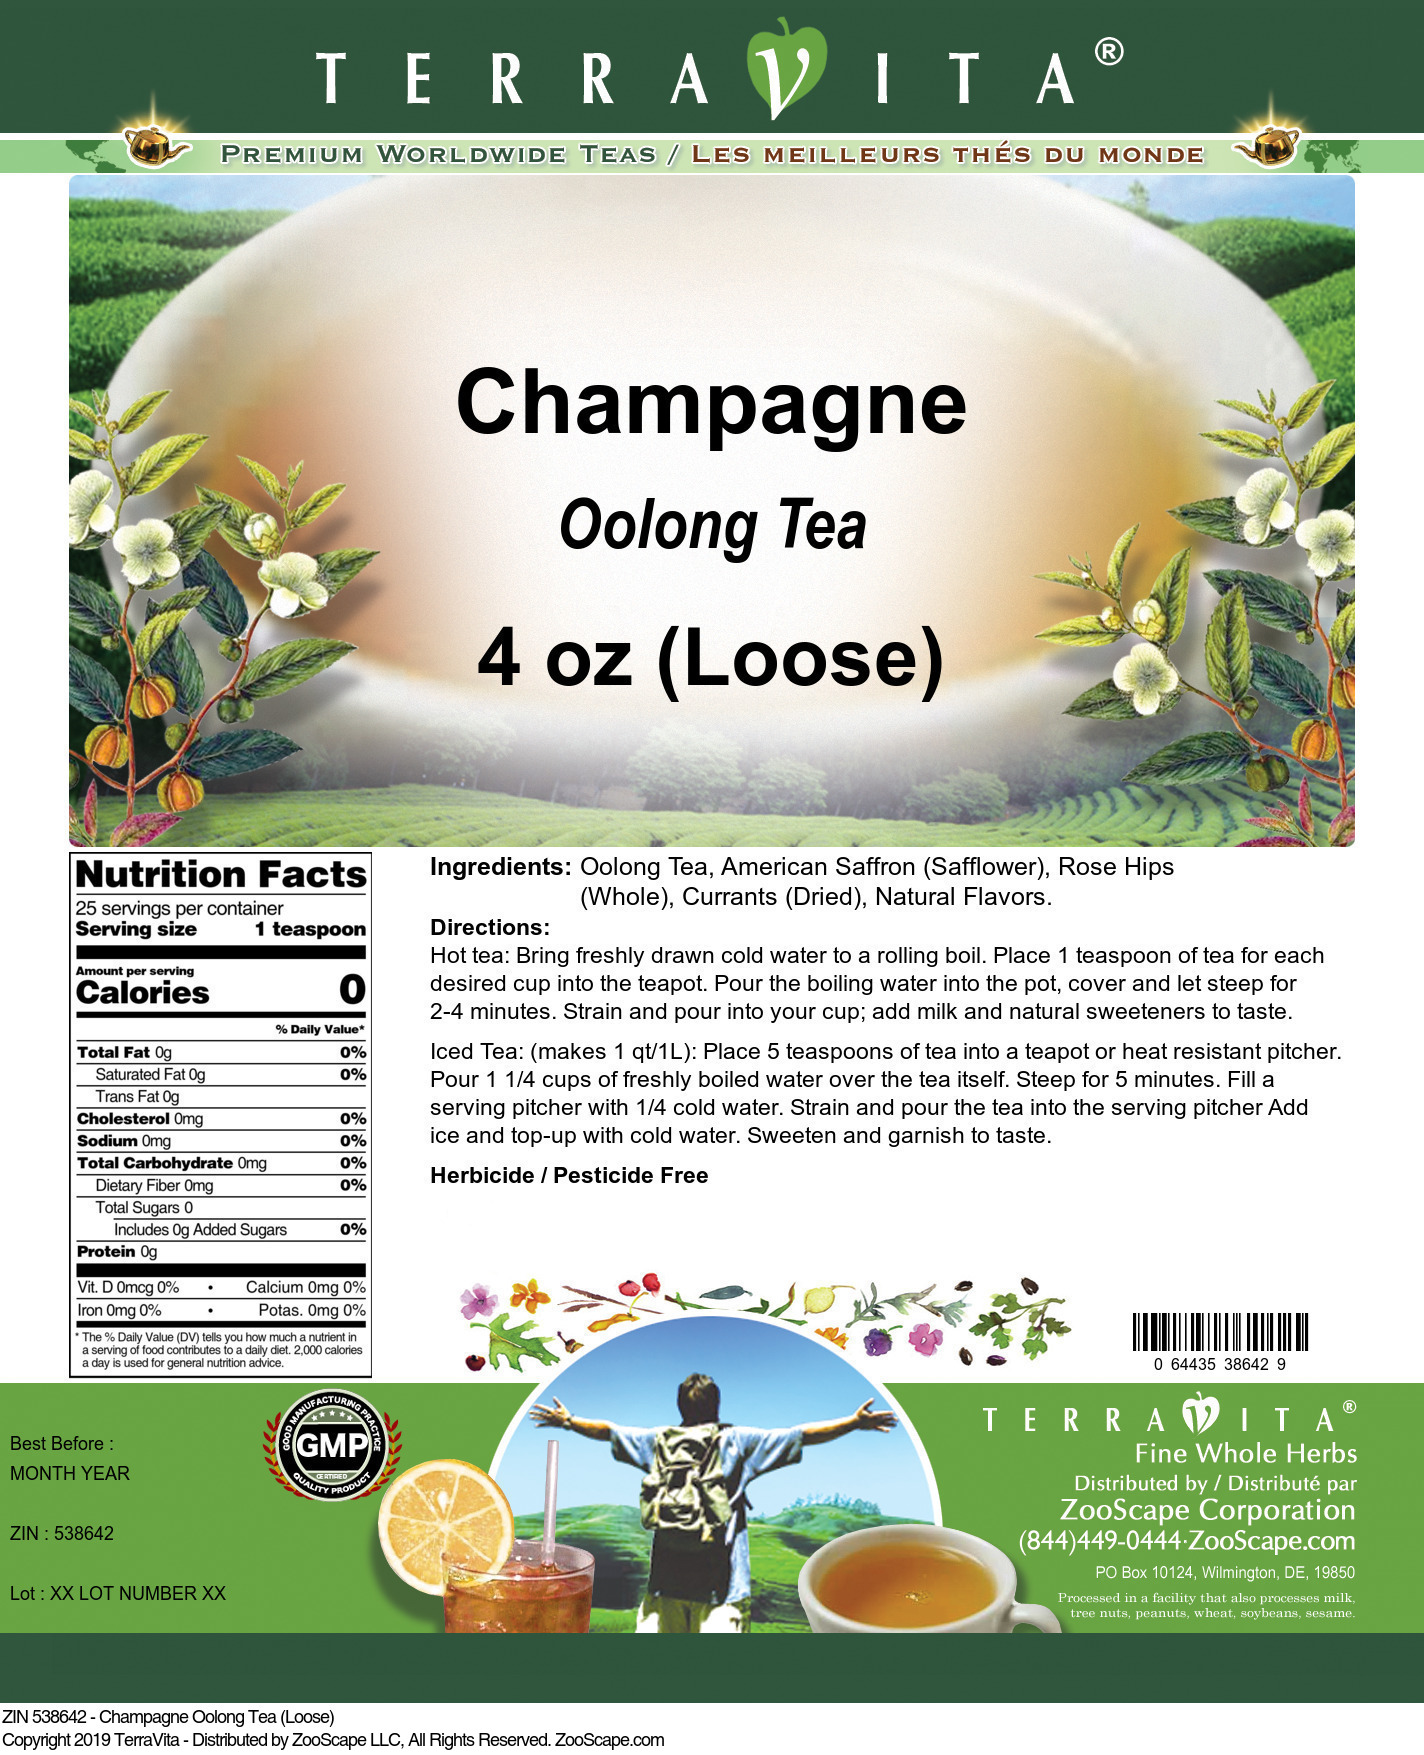 Champagne Oolong Tea (Loose)